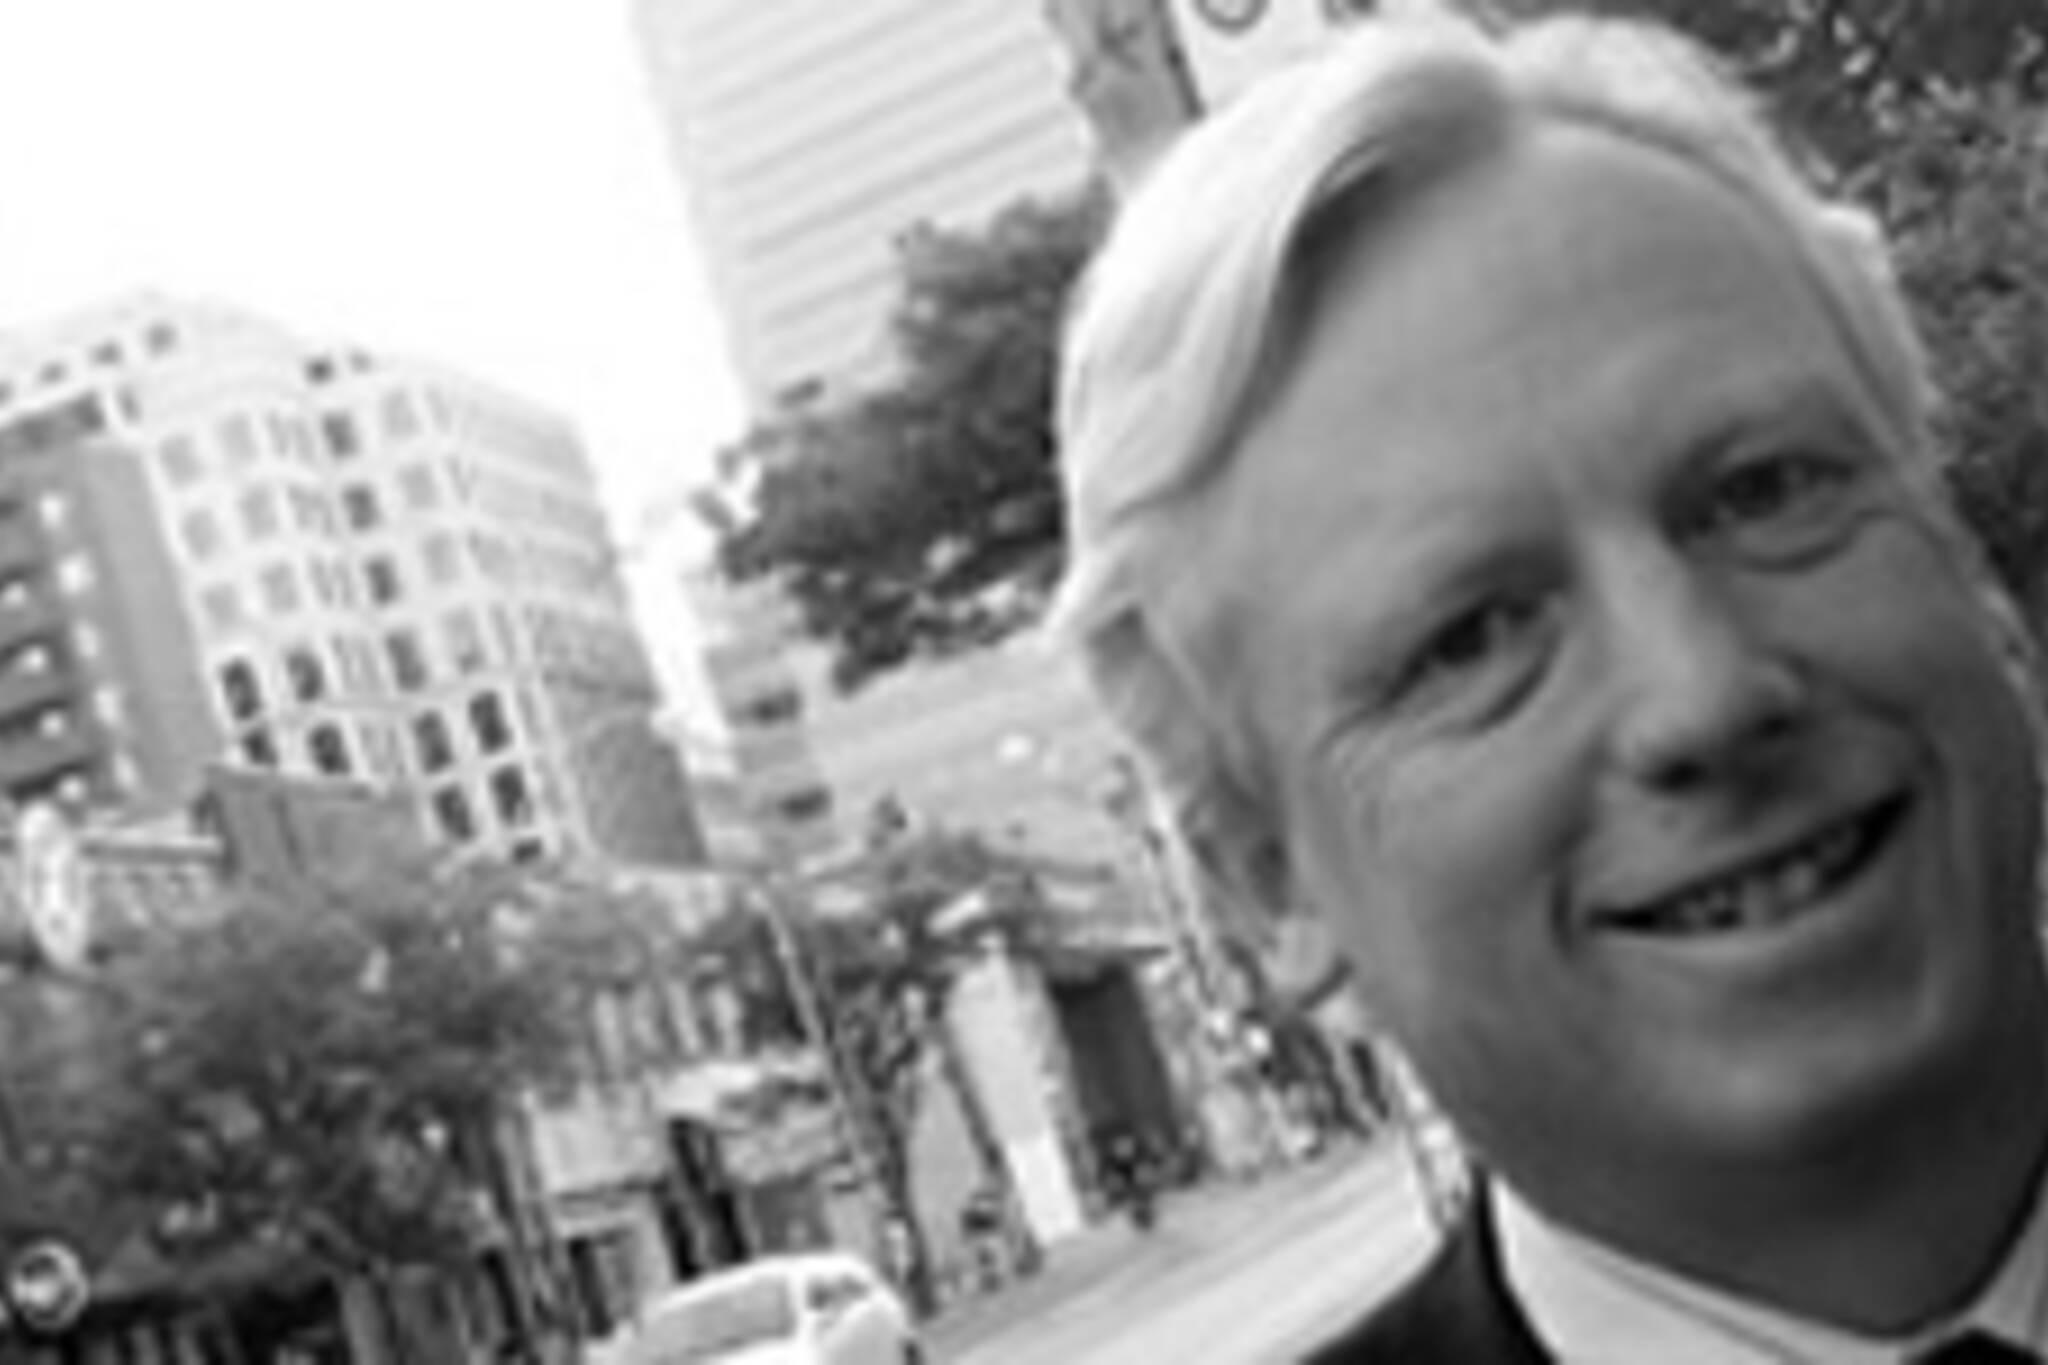 Toronto Mayor David Miller